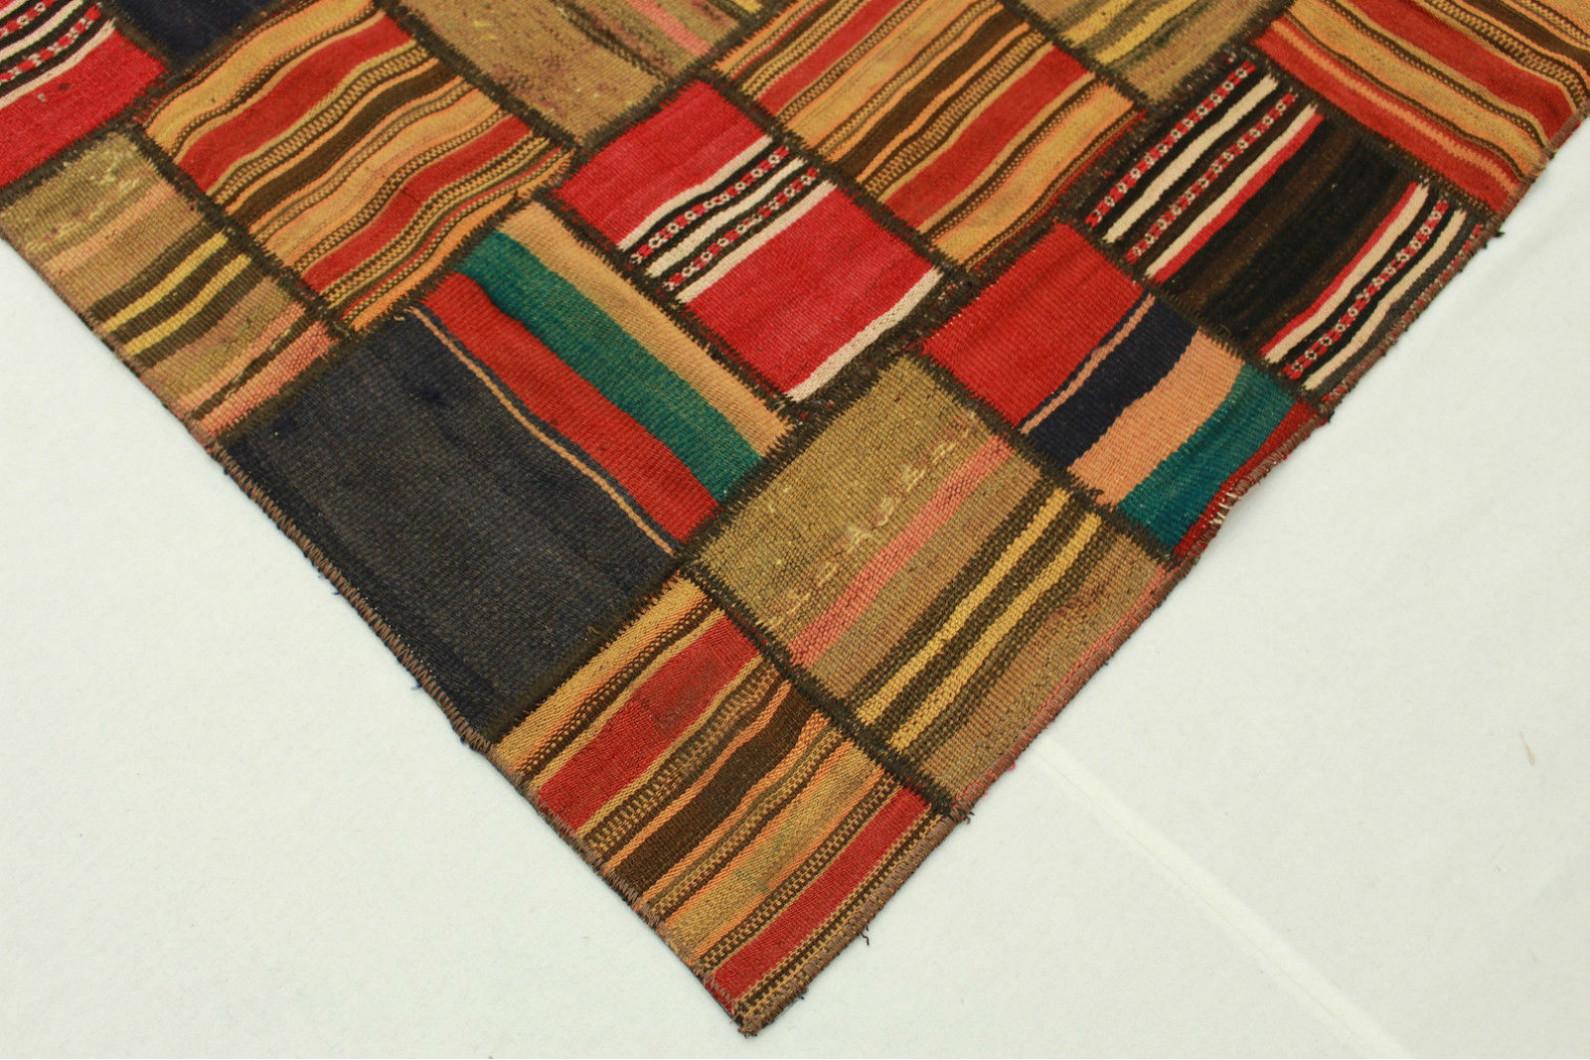 kelim patchwork teppich braun rot in 230x170cm 1001 2500. Black Bedroom Furniture Sets. Home Design Ideas